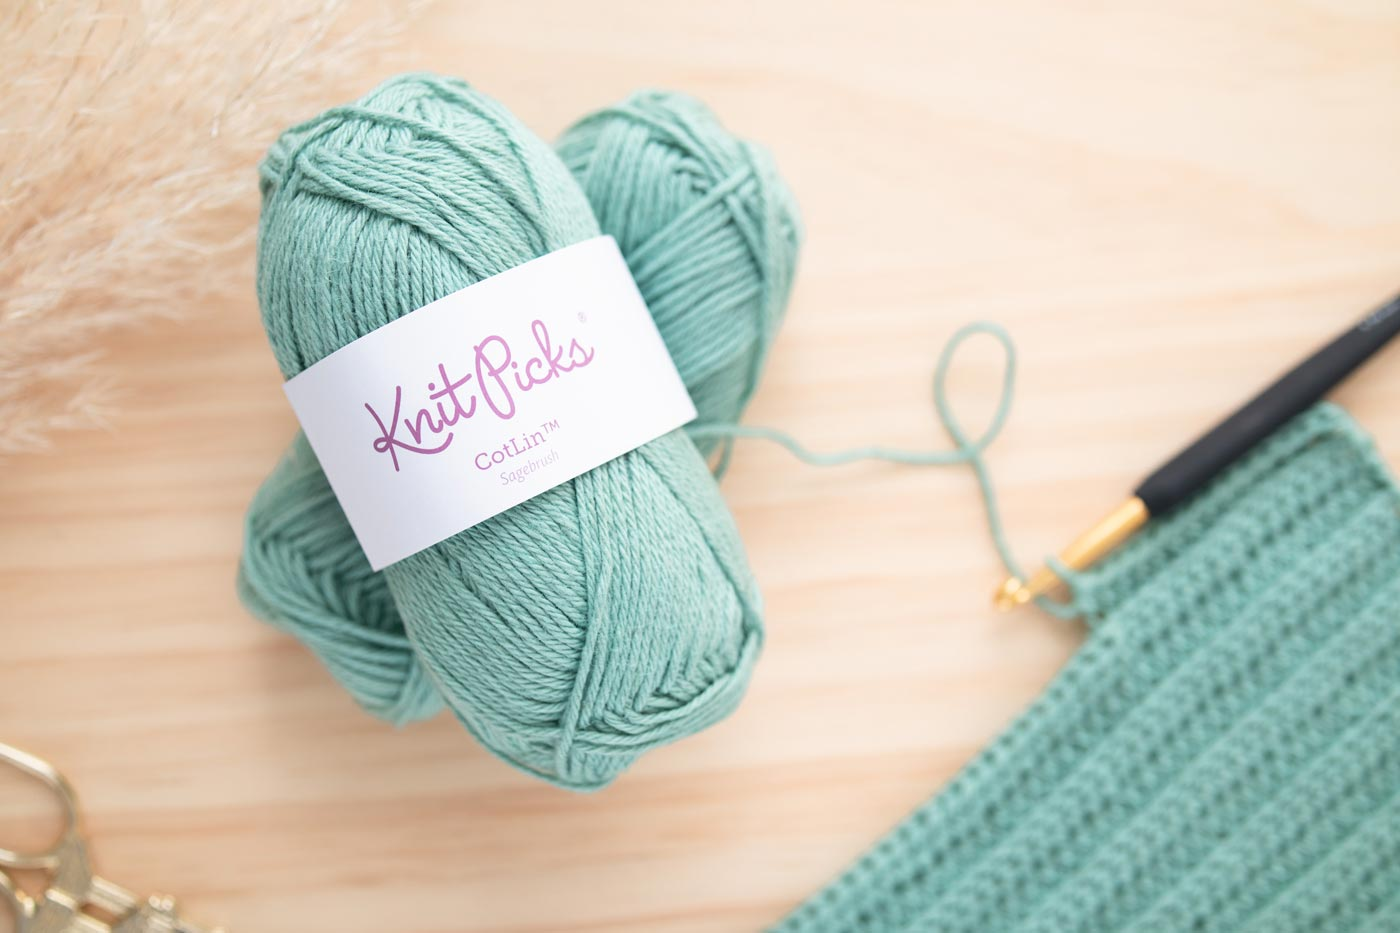 close up of wecrochet knitpicks sagebrush cotlin yarn